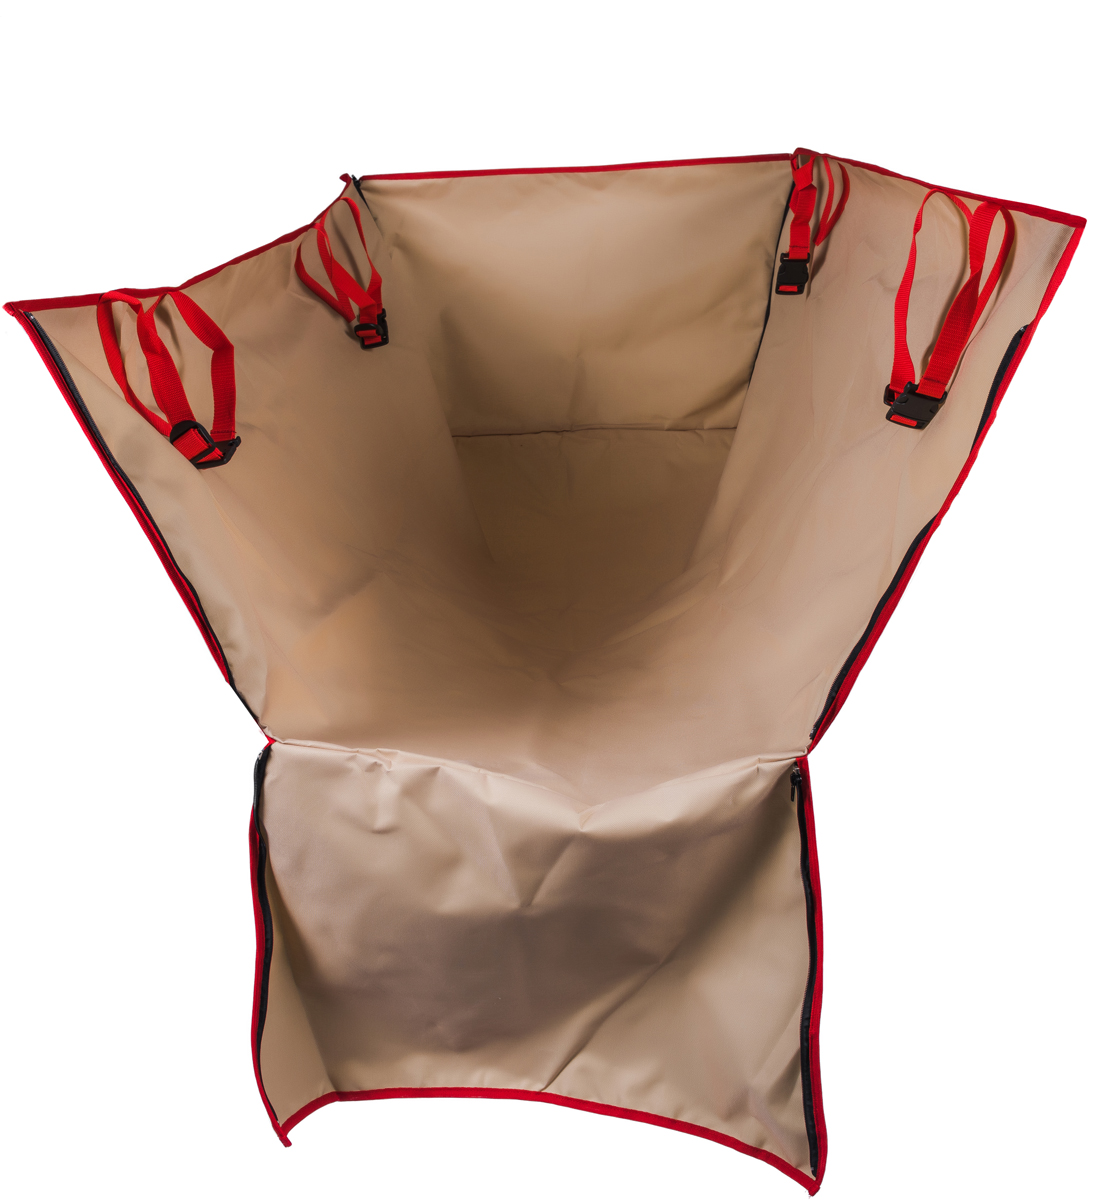 Автогамак для перевозки животных AvtoTink, с боковой защитой, цвет: бежевый, 150 х 120 х 43 см блуза vero moda vero moda ve389ewvpj60